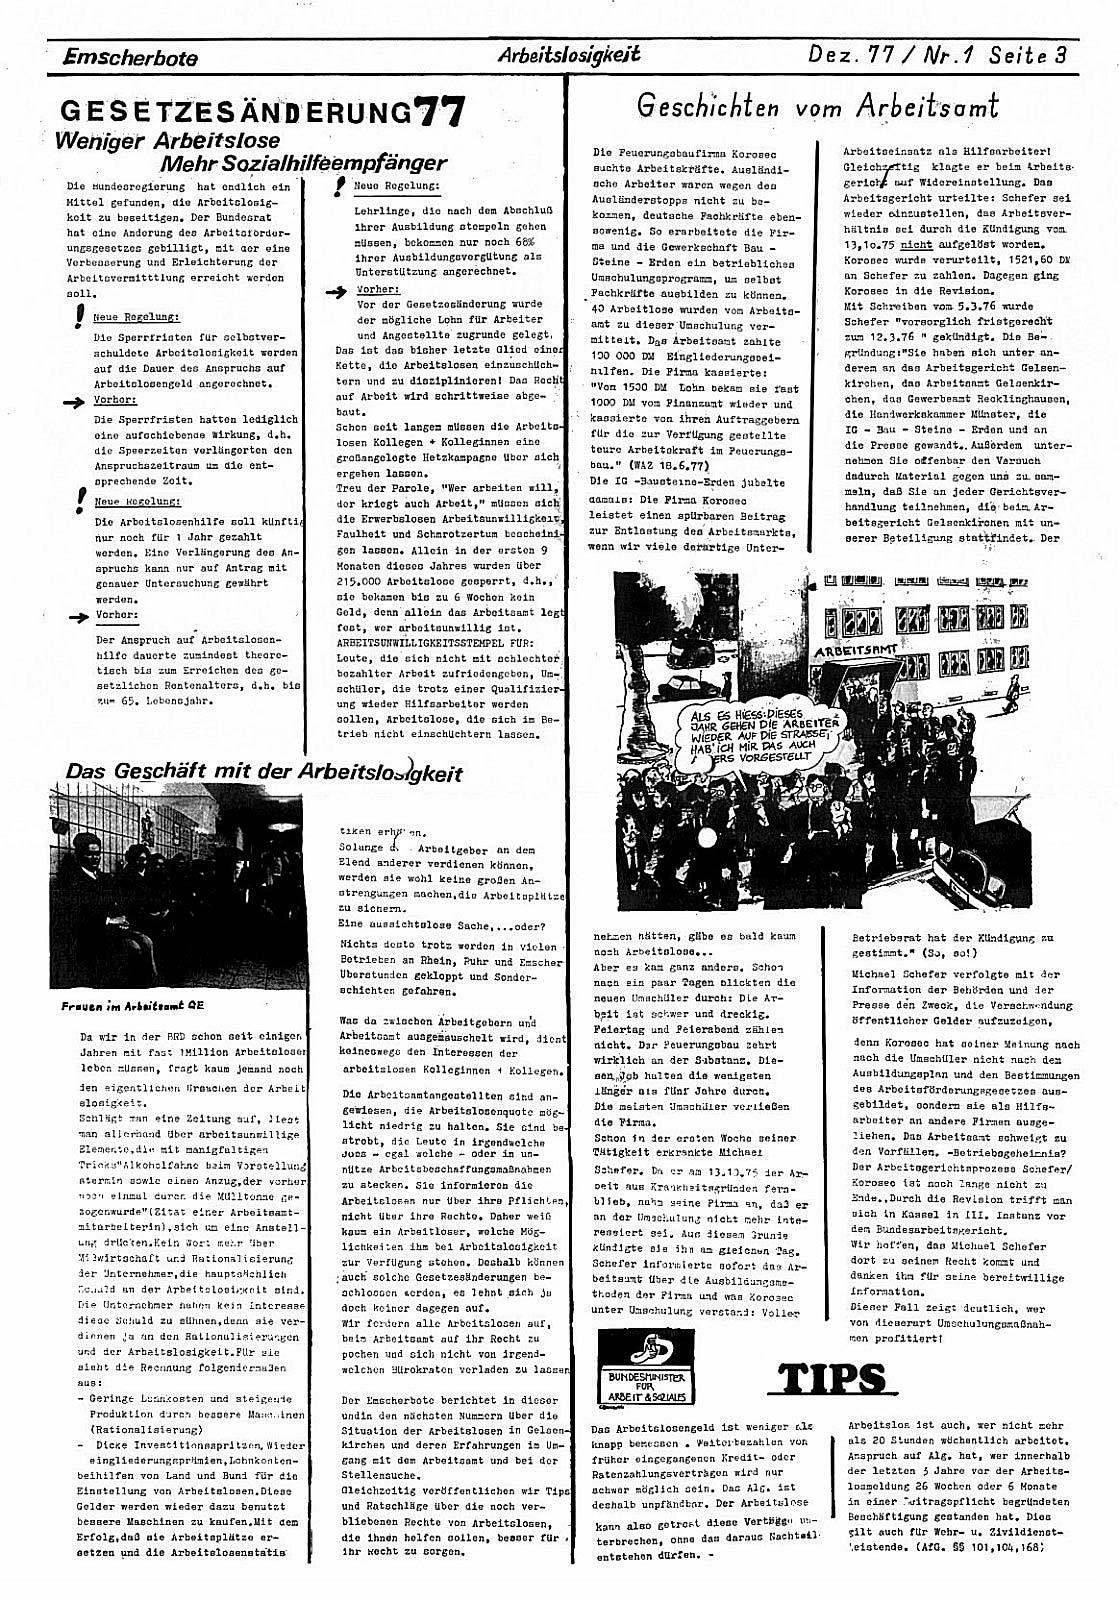 Gelsenkirchen_Emscherbote_1977_01_03